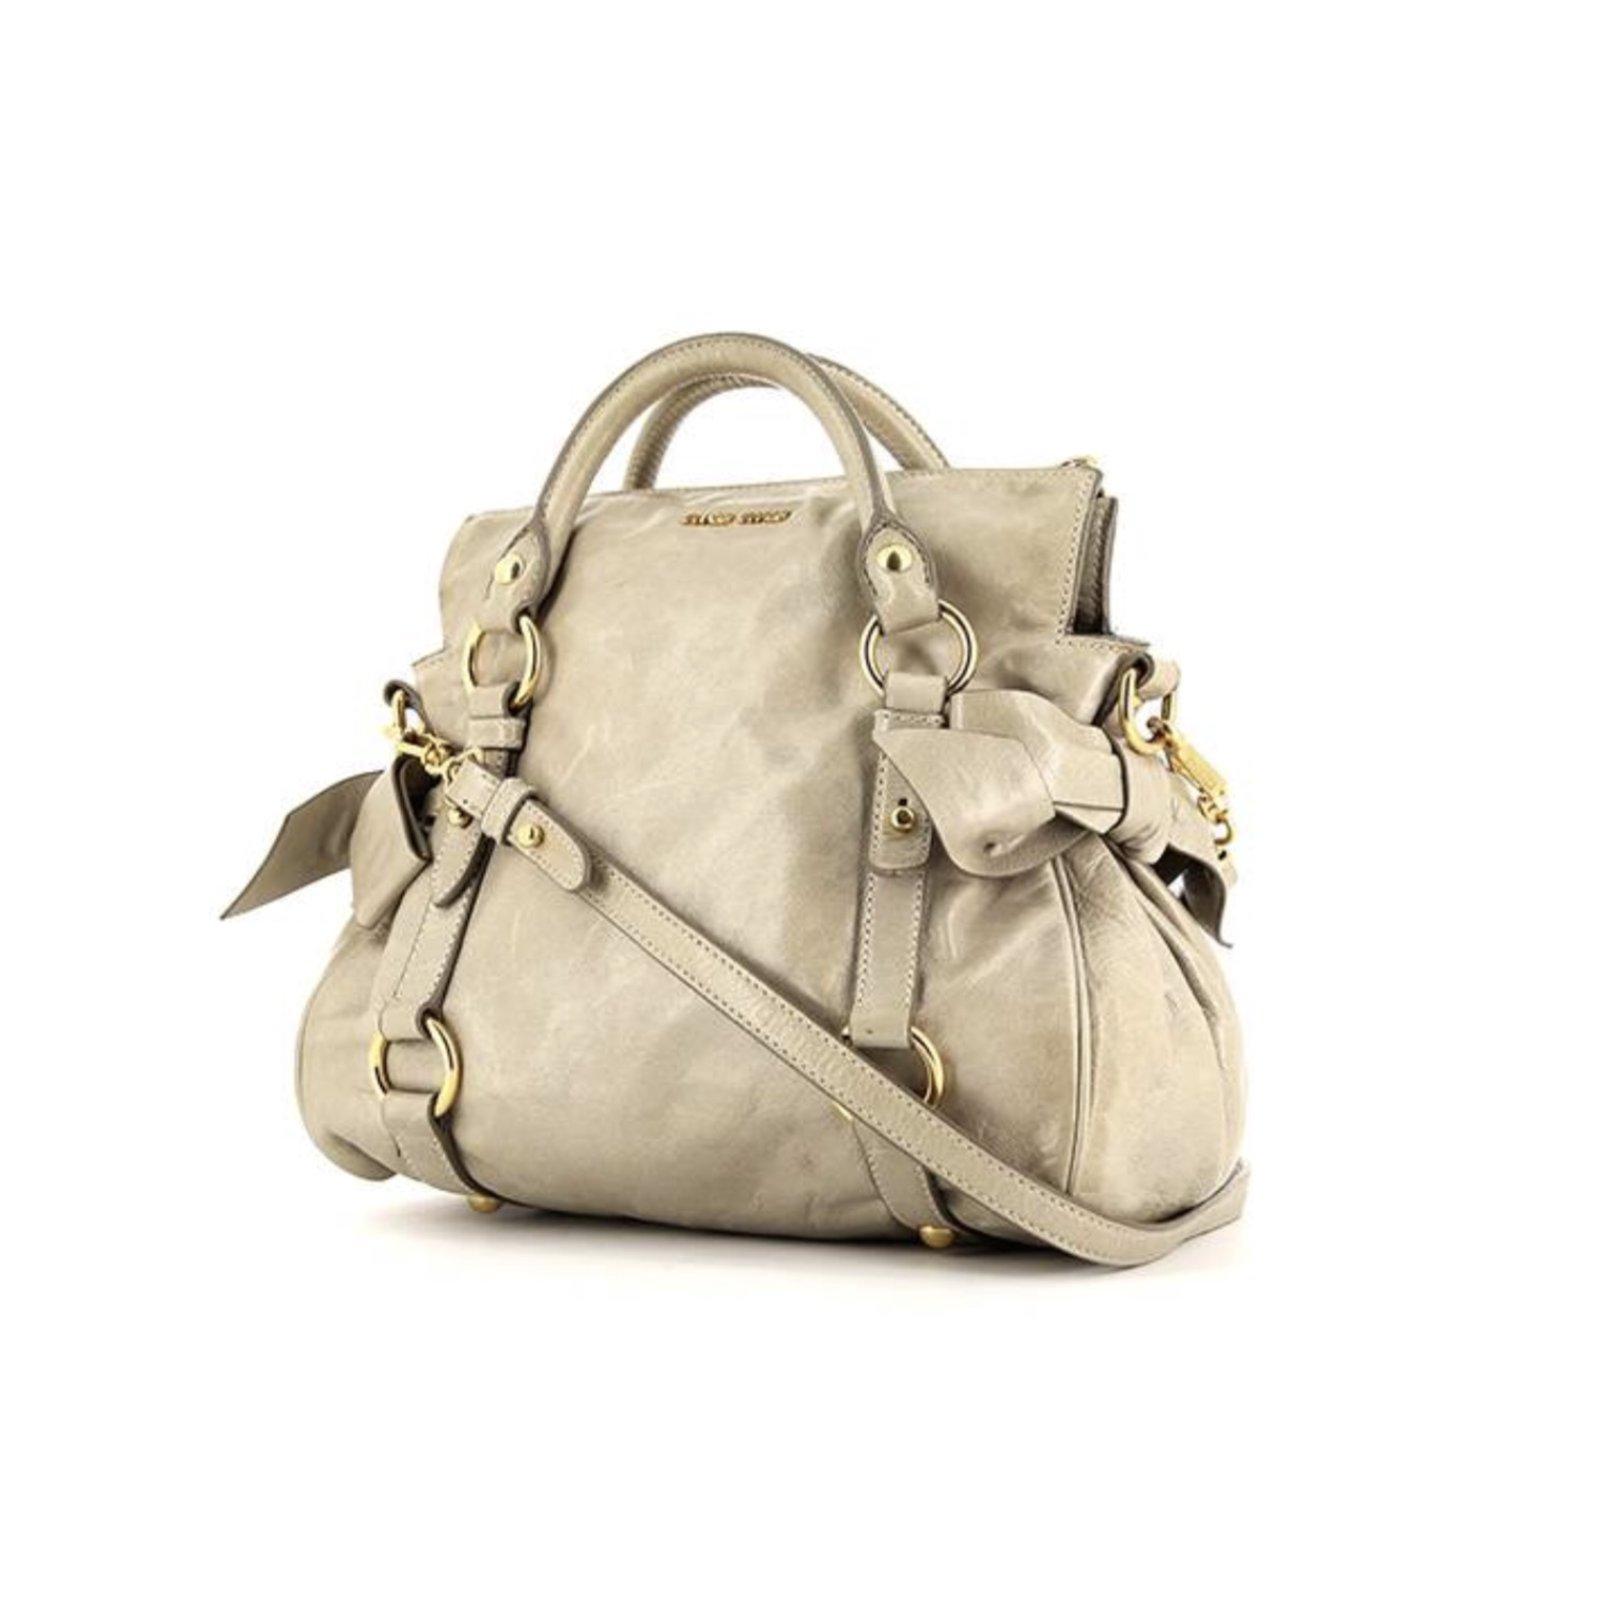 Miu Handbags Leather Beige